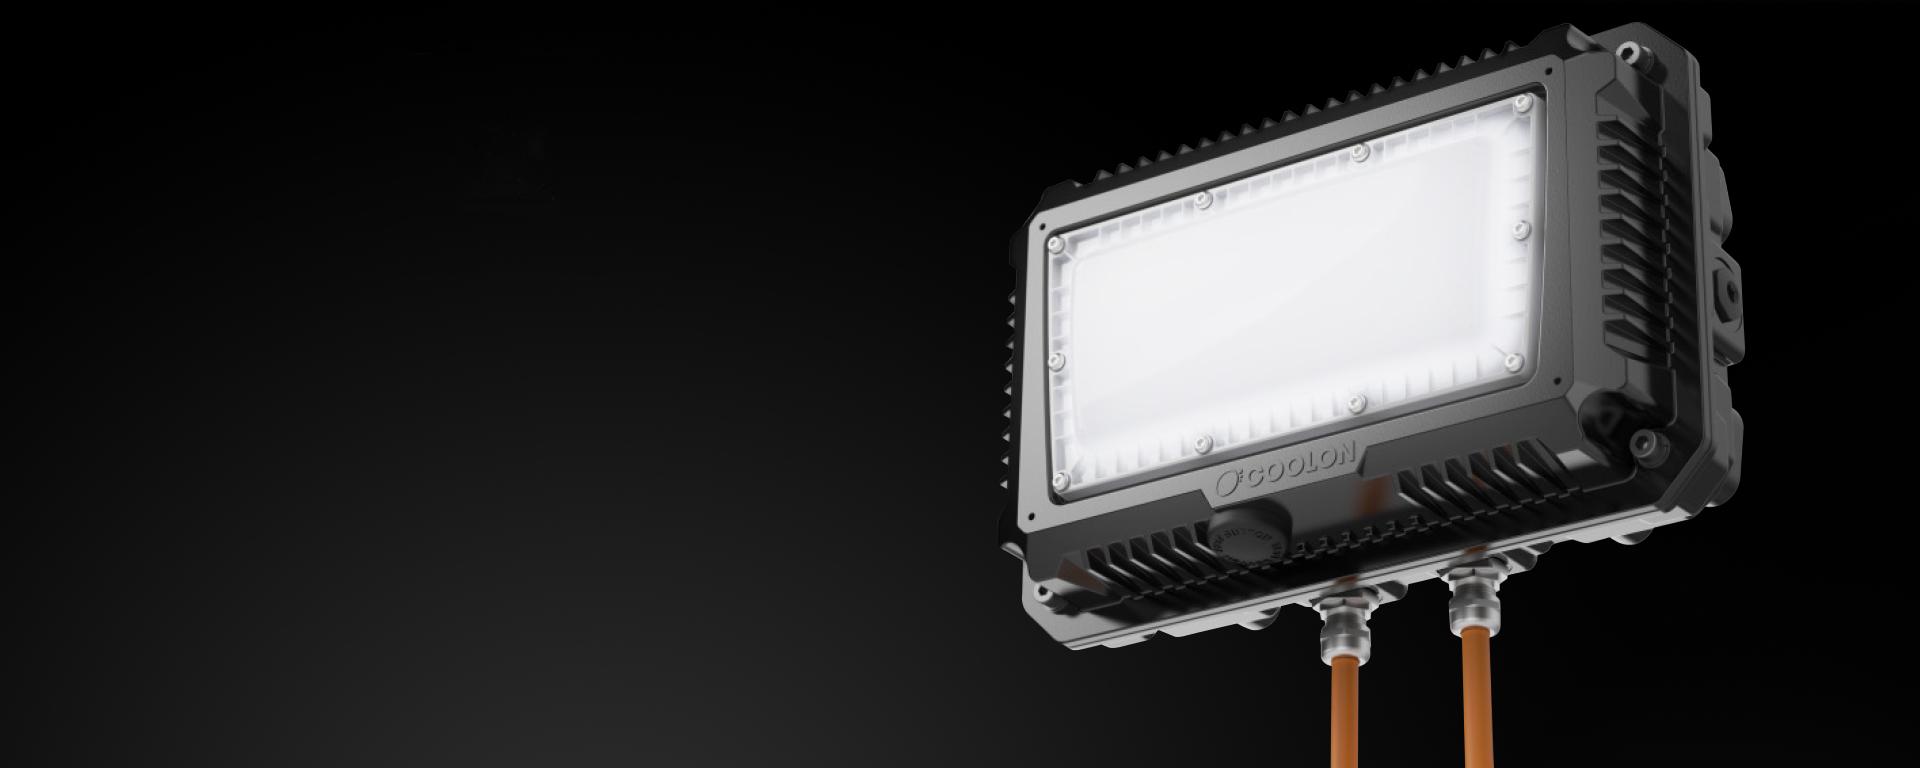 Emergency Bulkhead / Bulkhead LED mining light close up